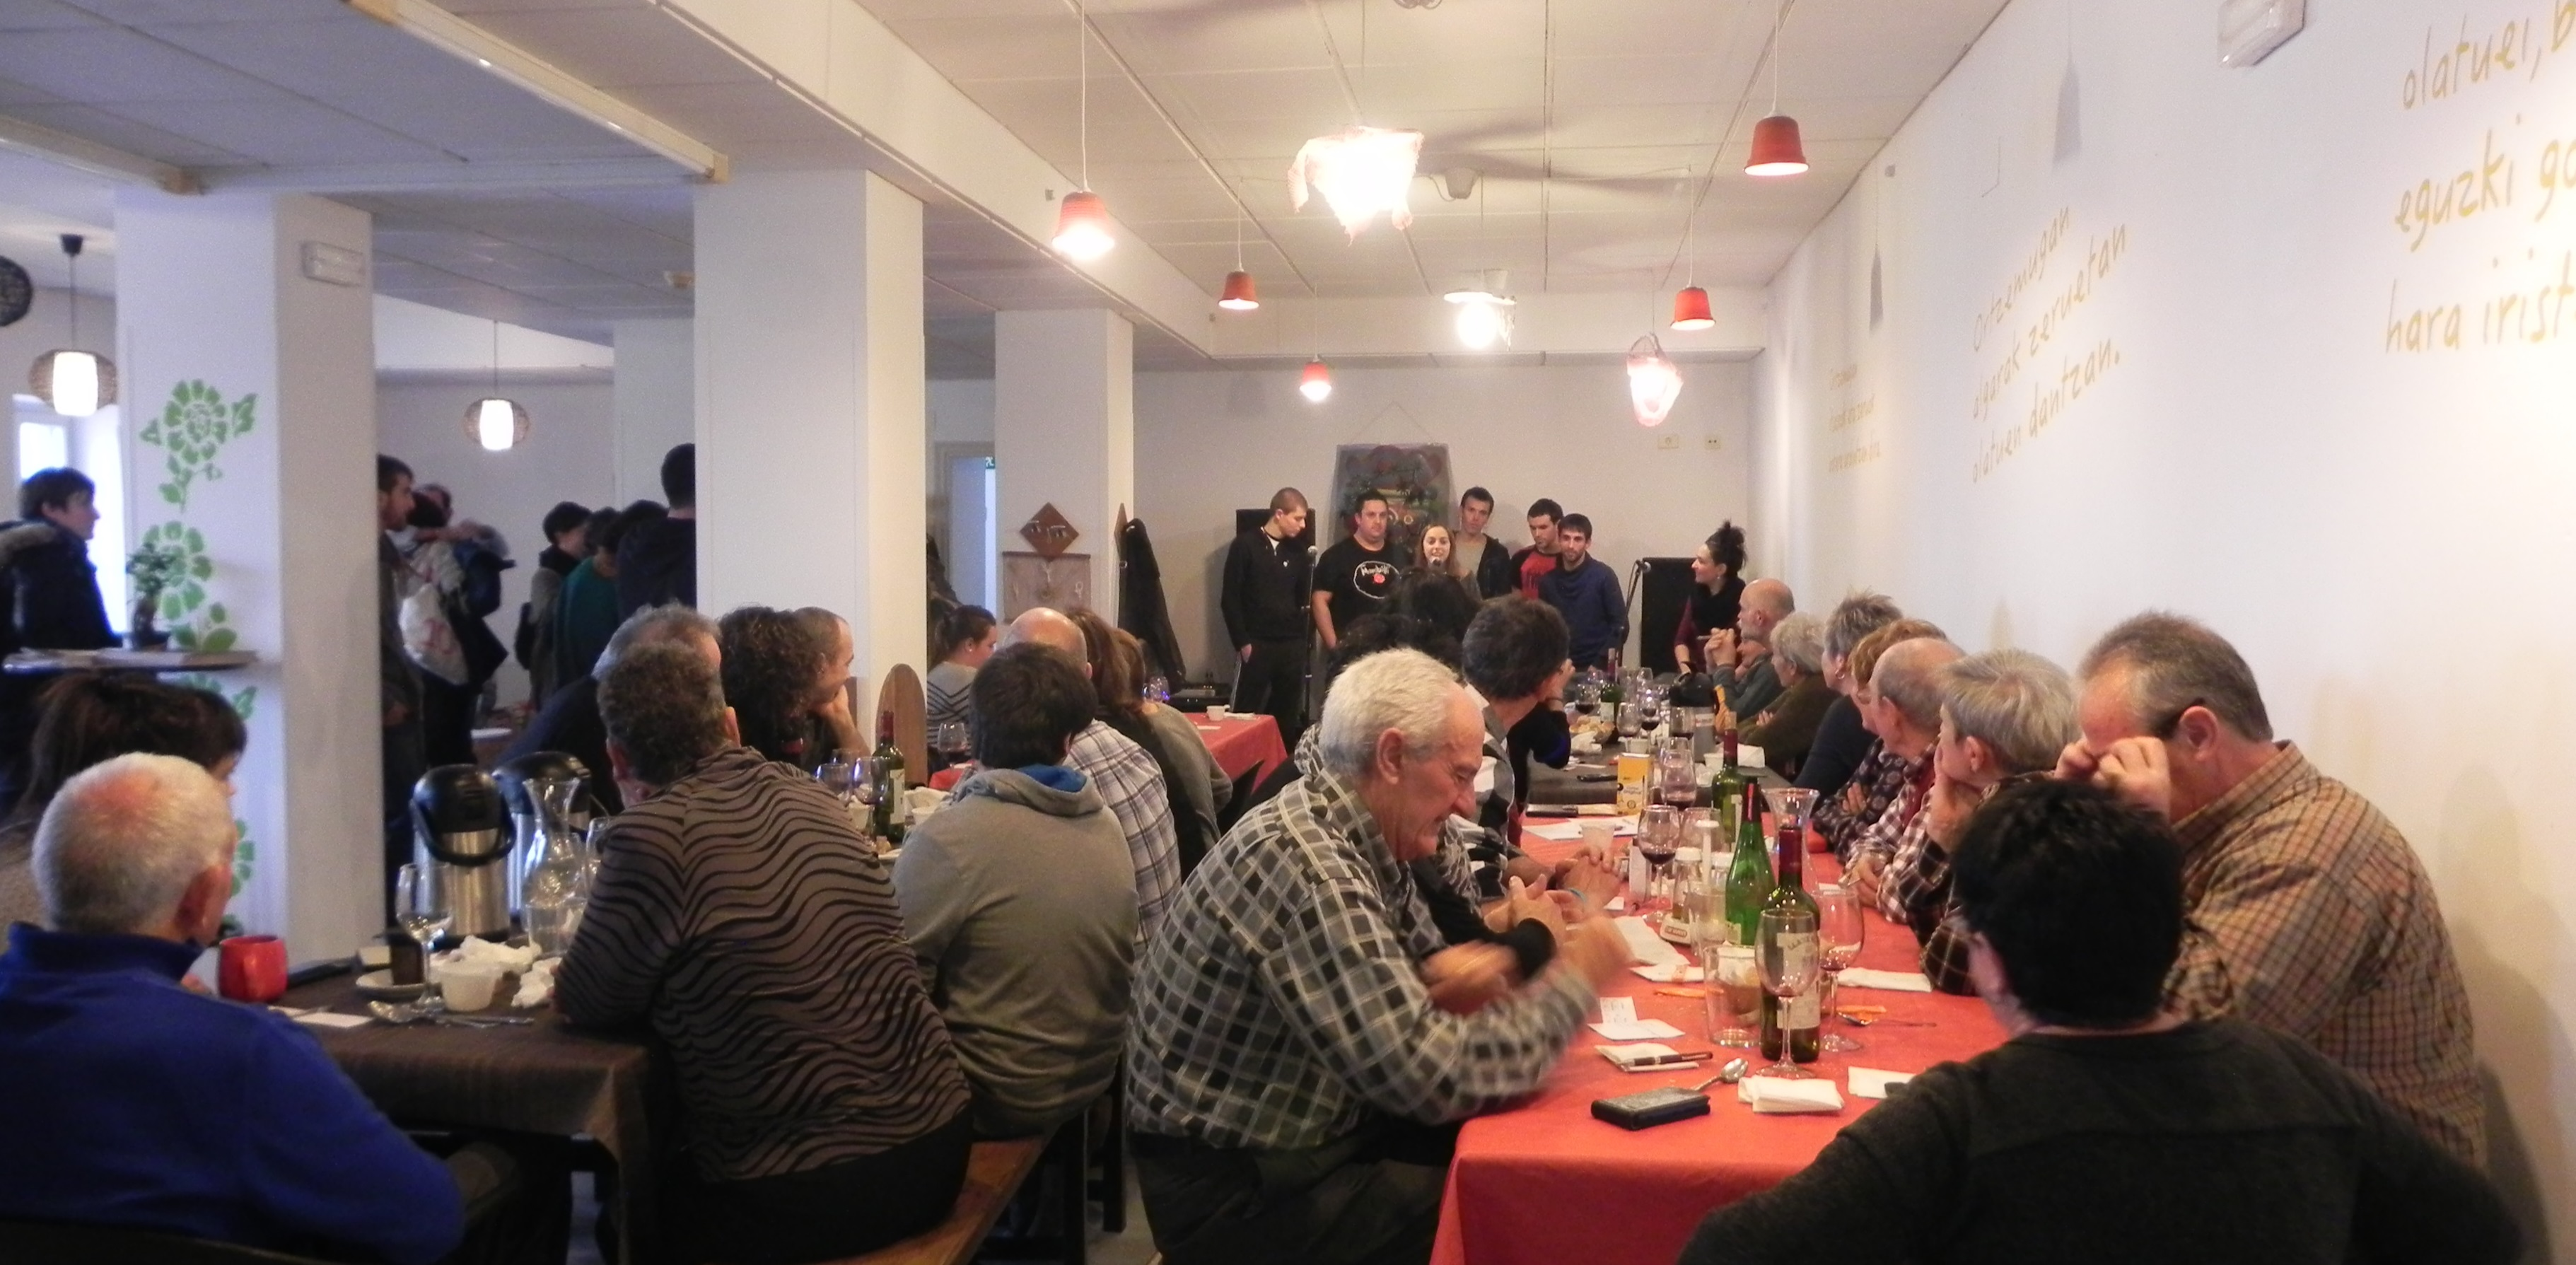 2015-12-12 Lea-Artibai